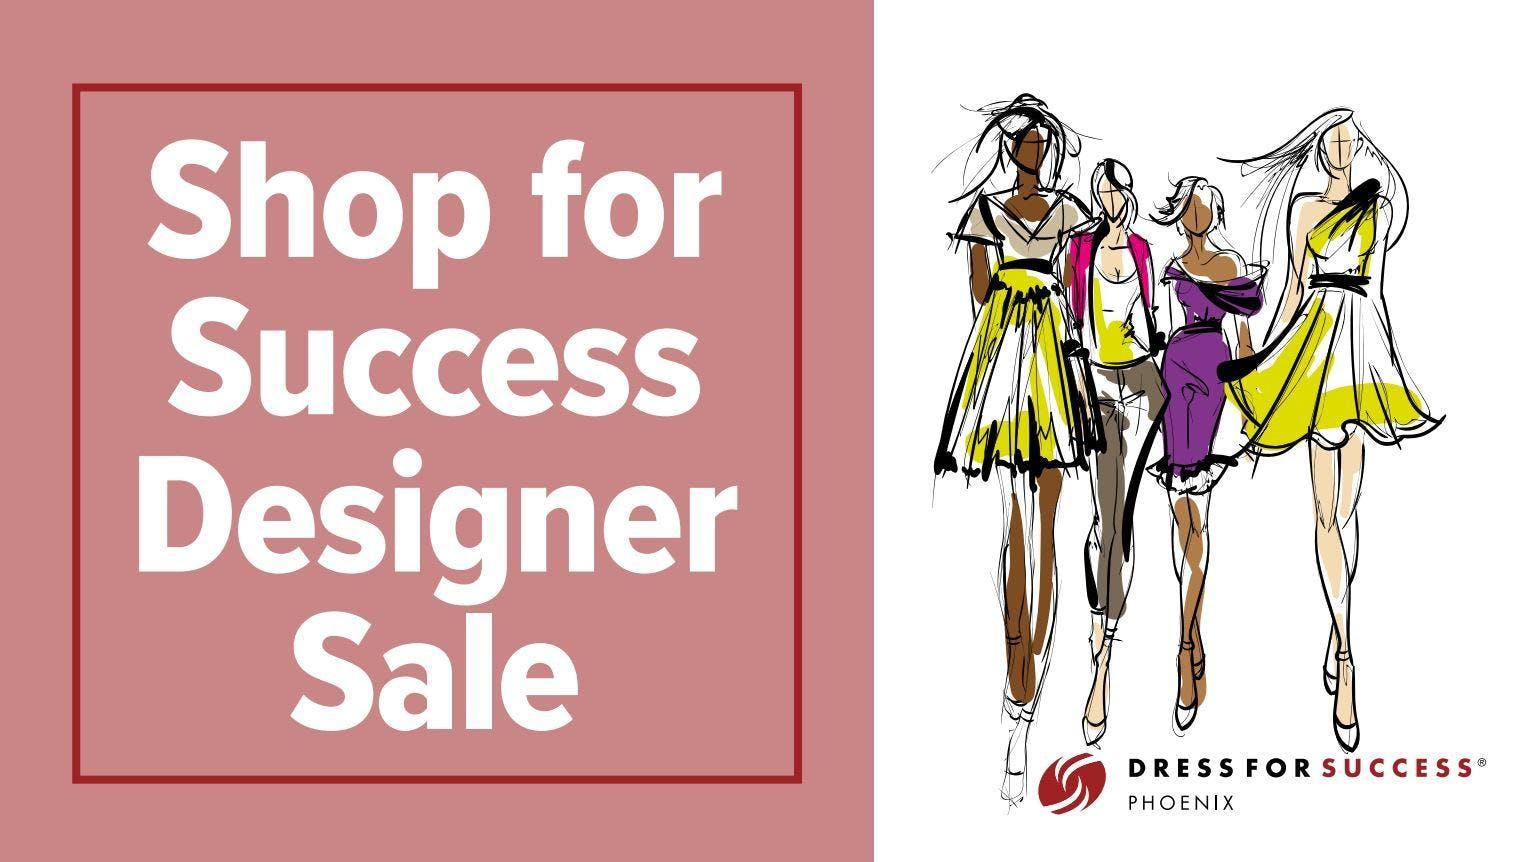 Shop for Success Designer Sale